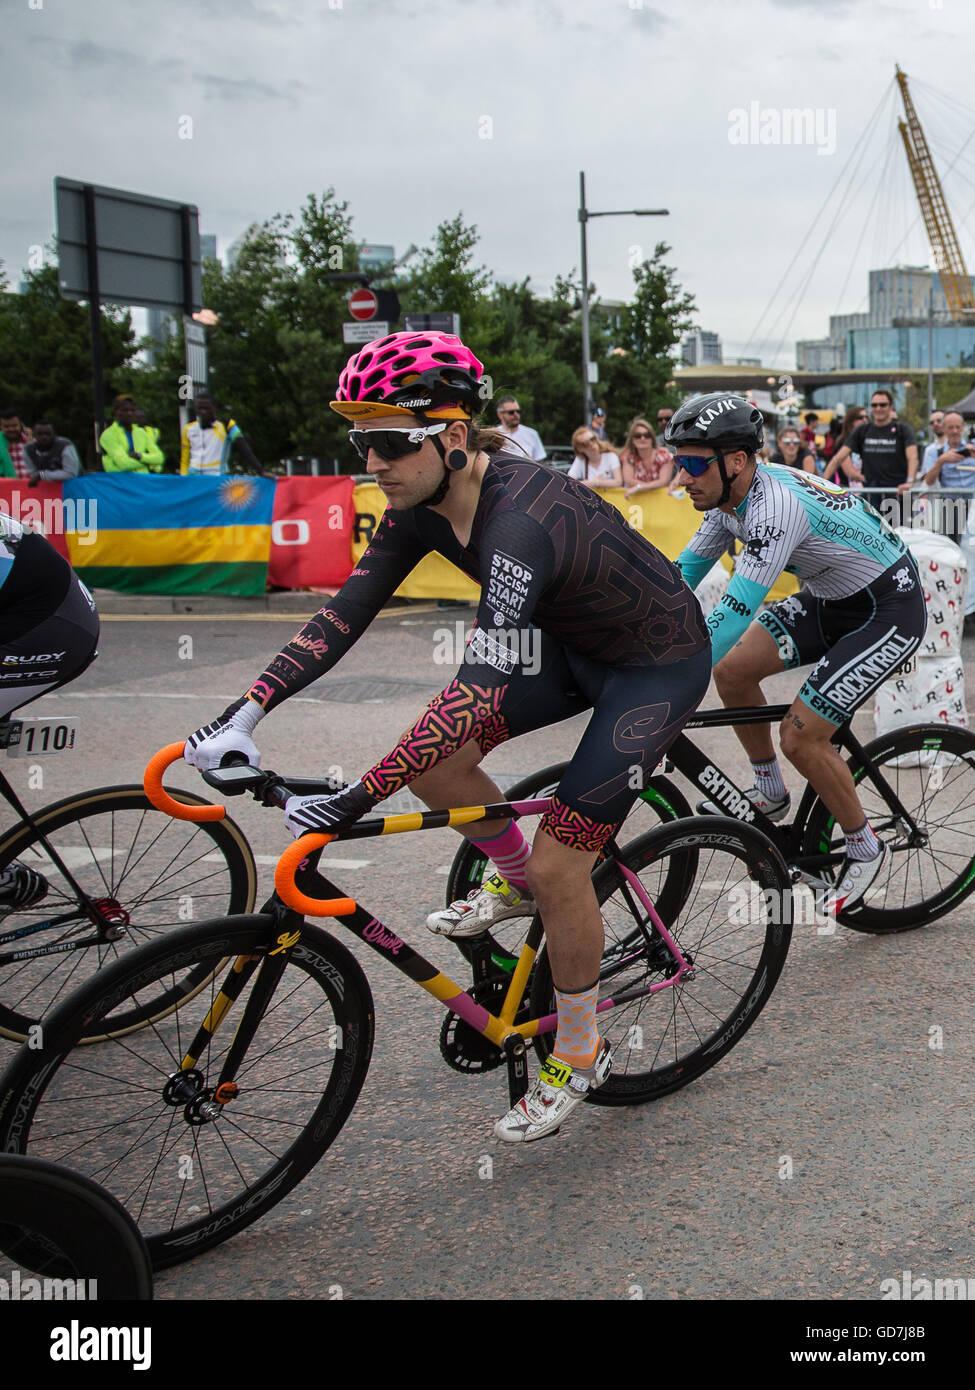 Red Hook Crit London 2016 Cycling Criterium Bike Race Fixed